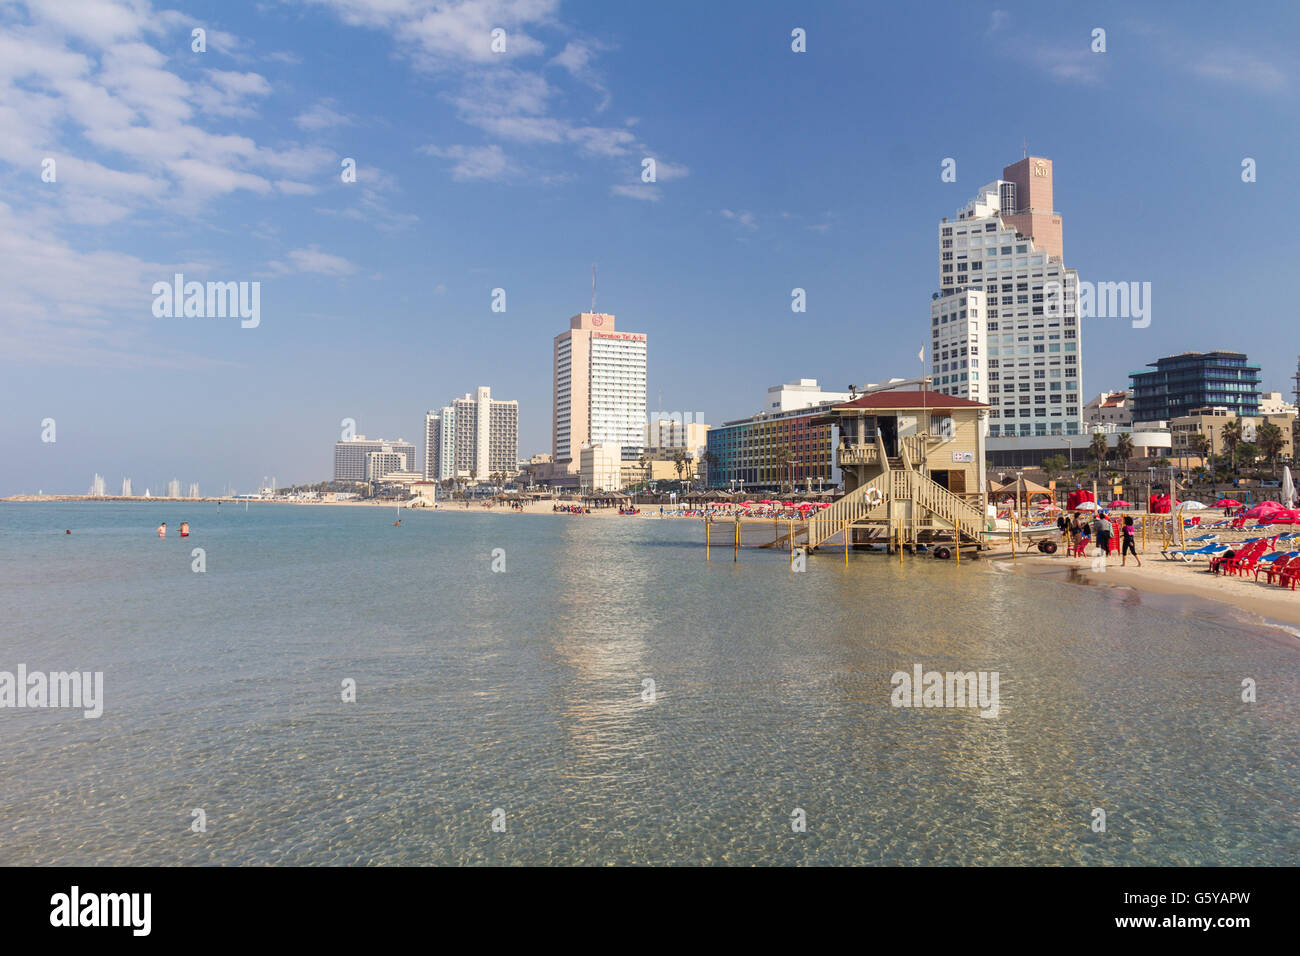 View of Tel Aviv beach front - Stock Image